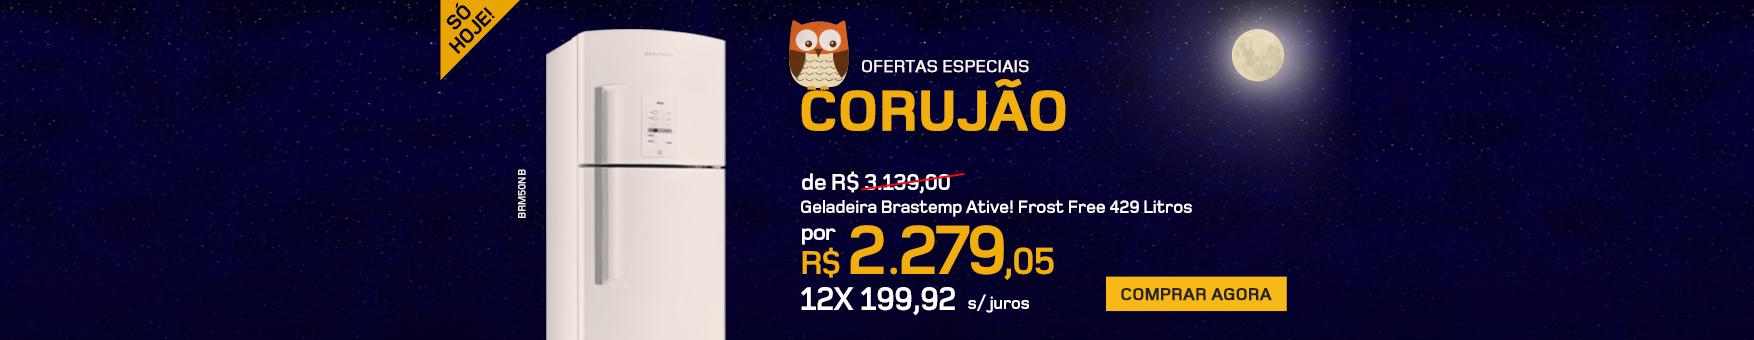 Corujão 2